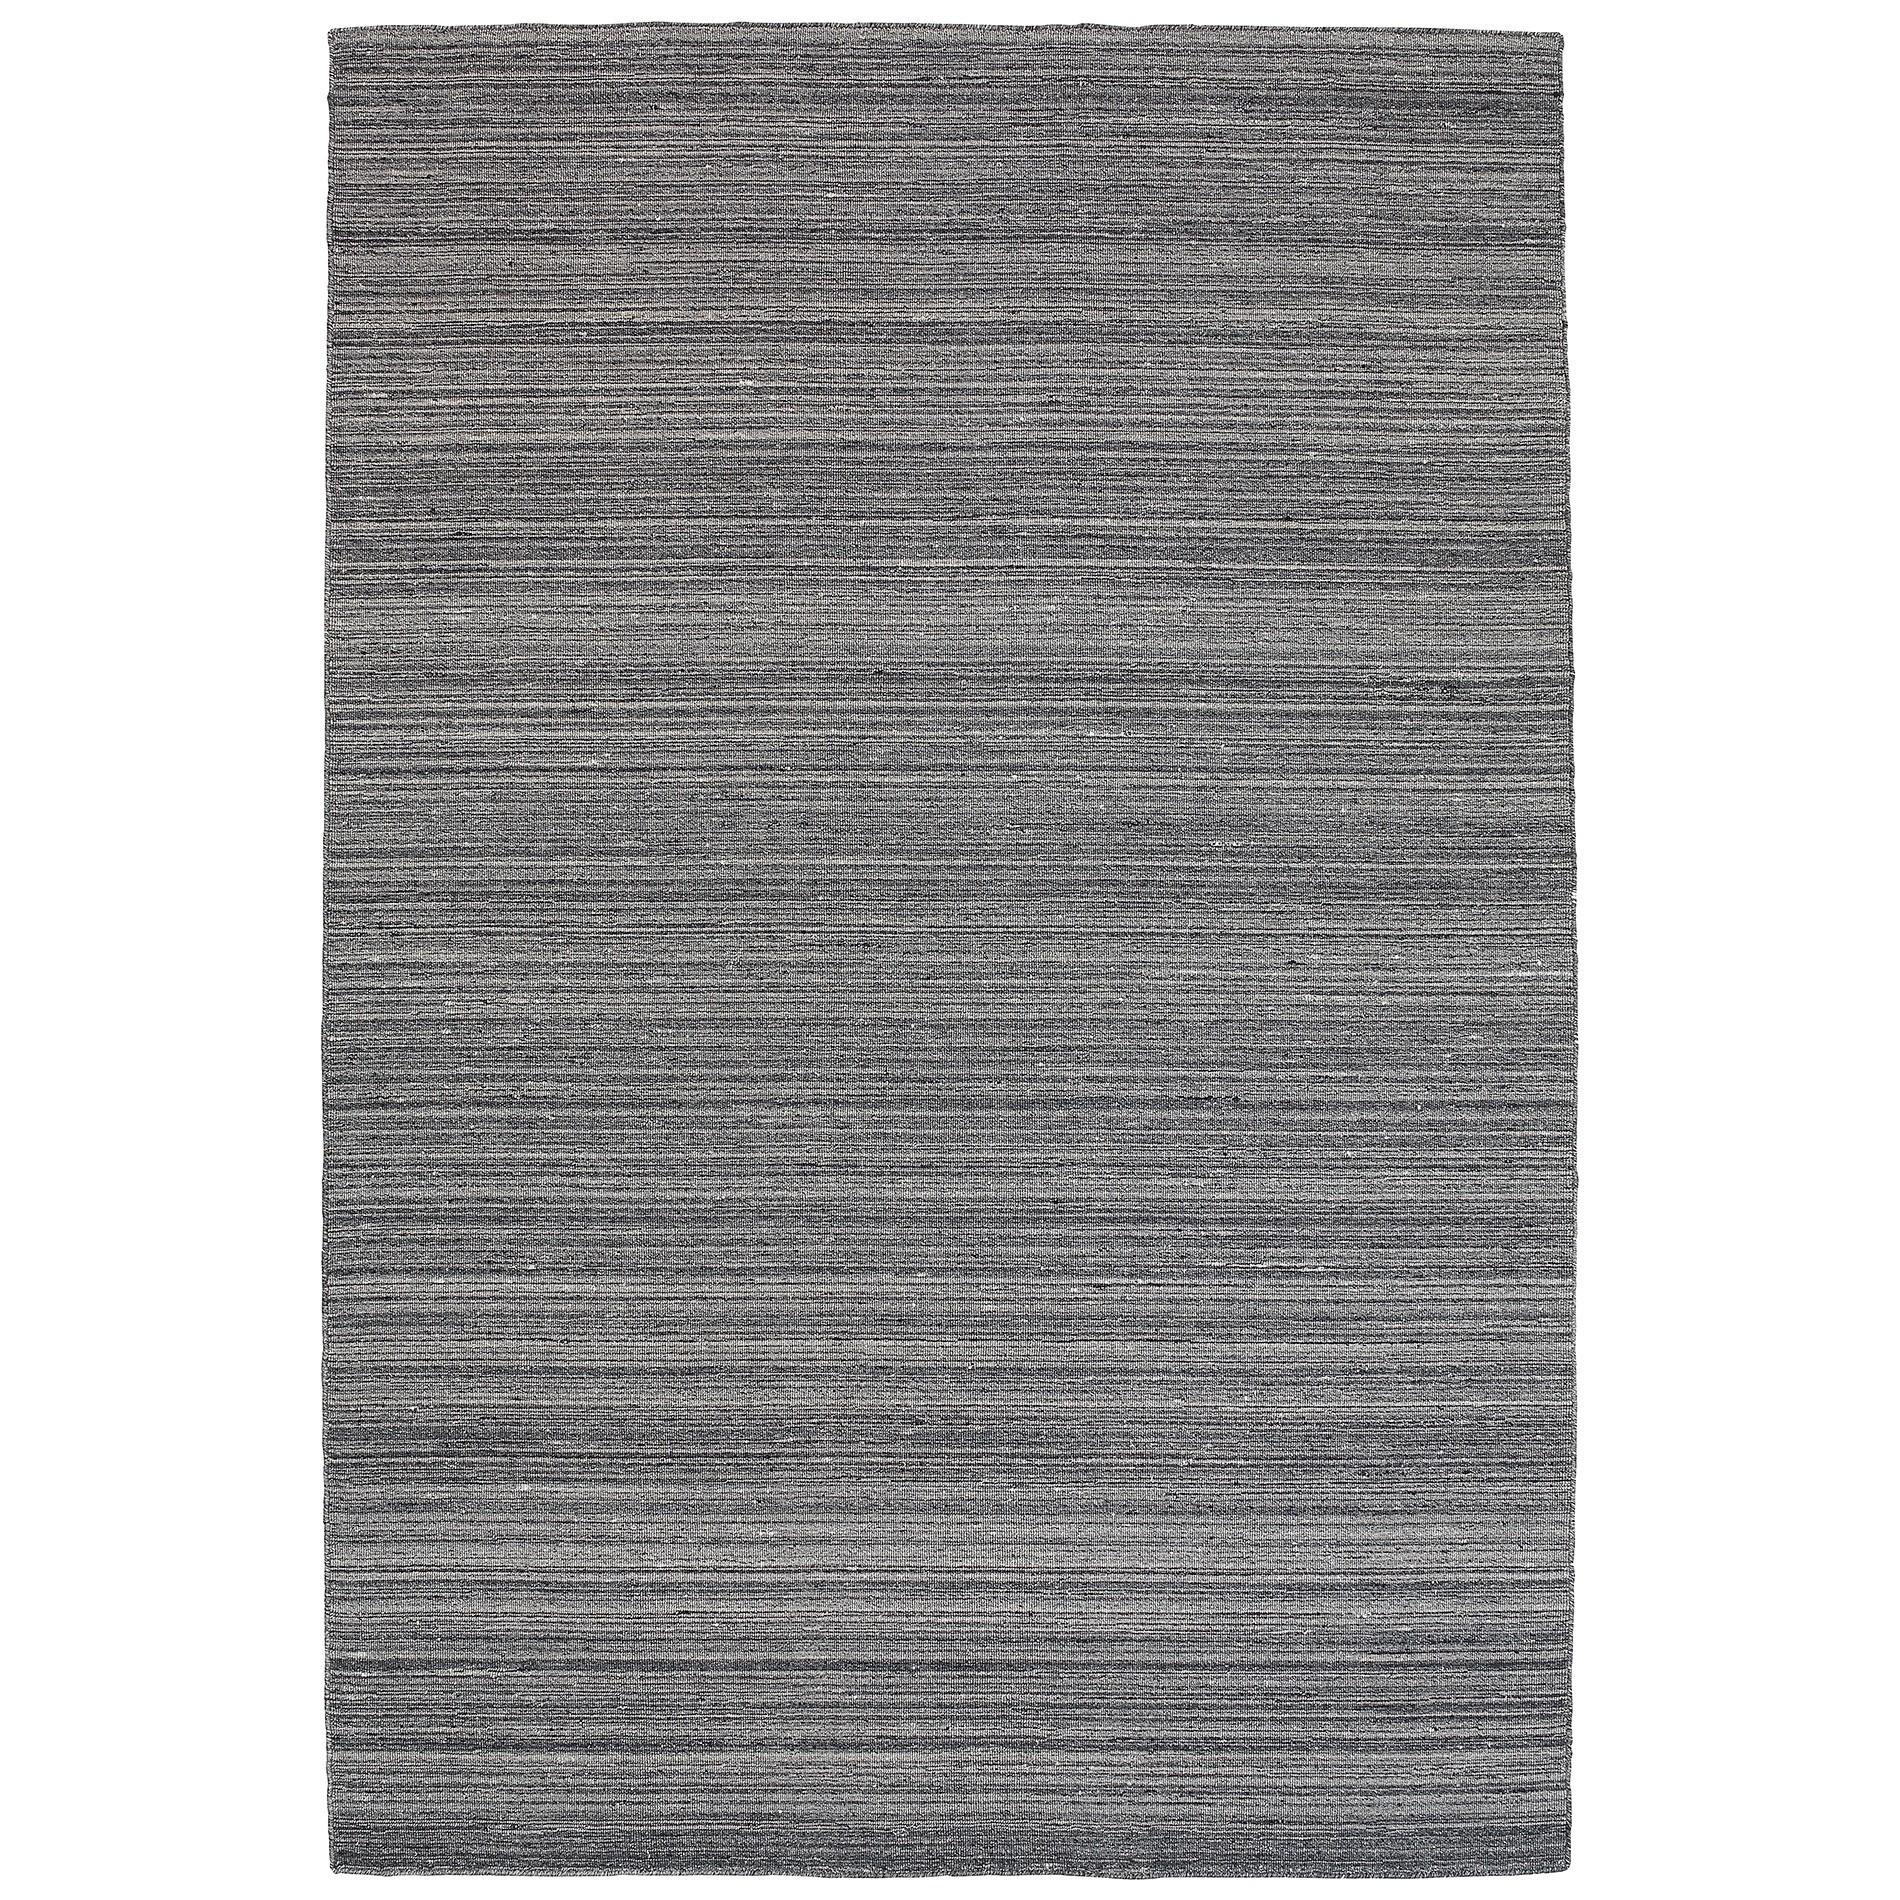 Loom Wool Rug, 330x240cm, Smoke